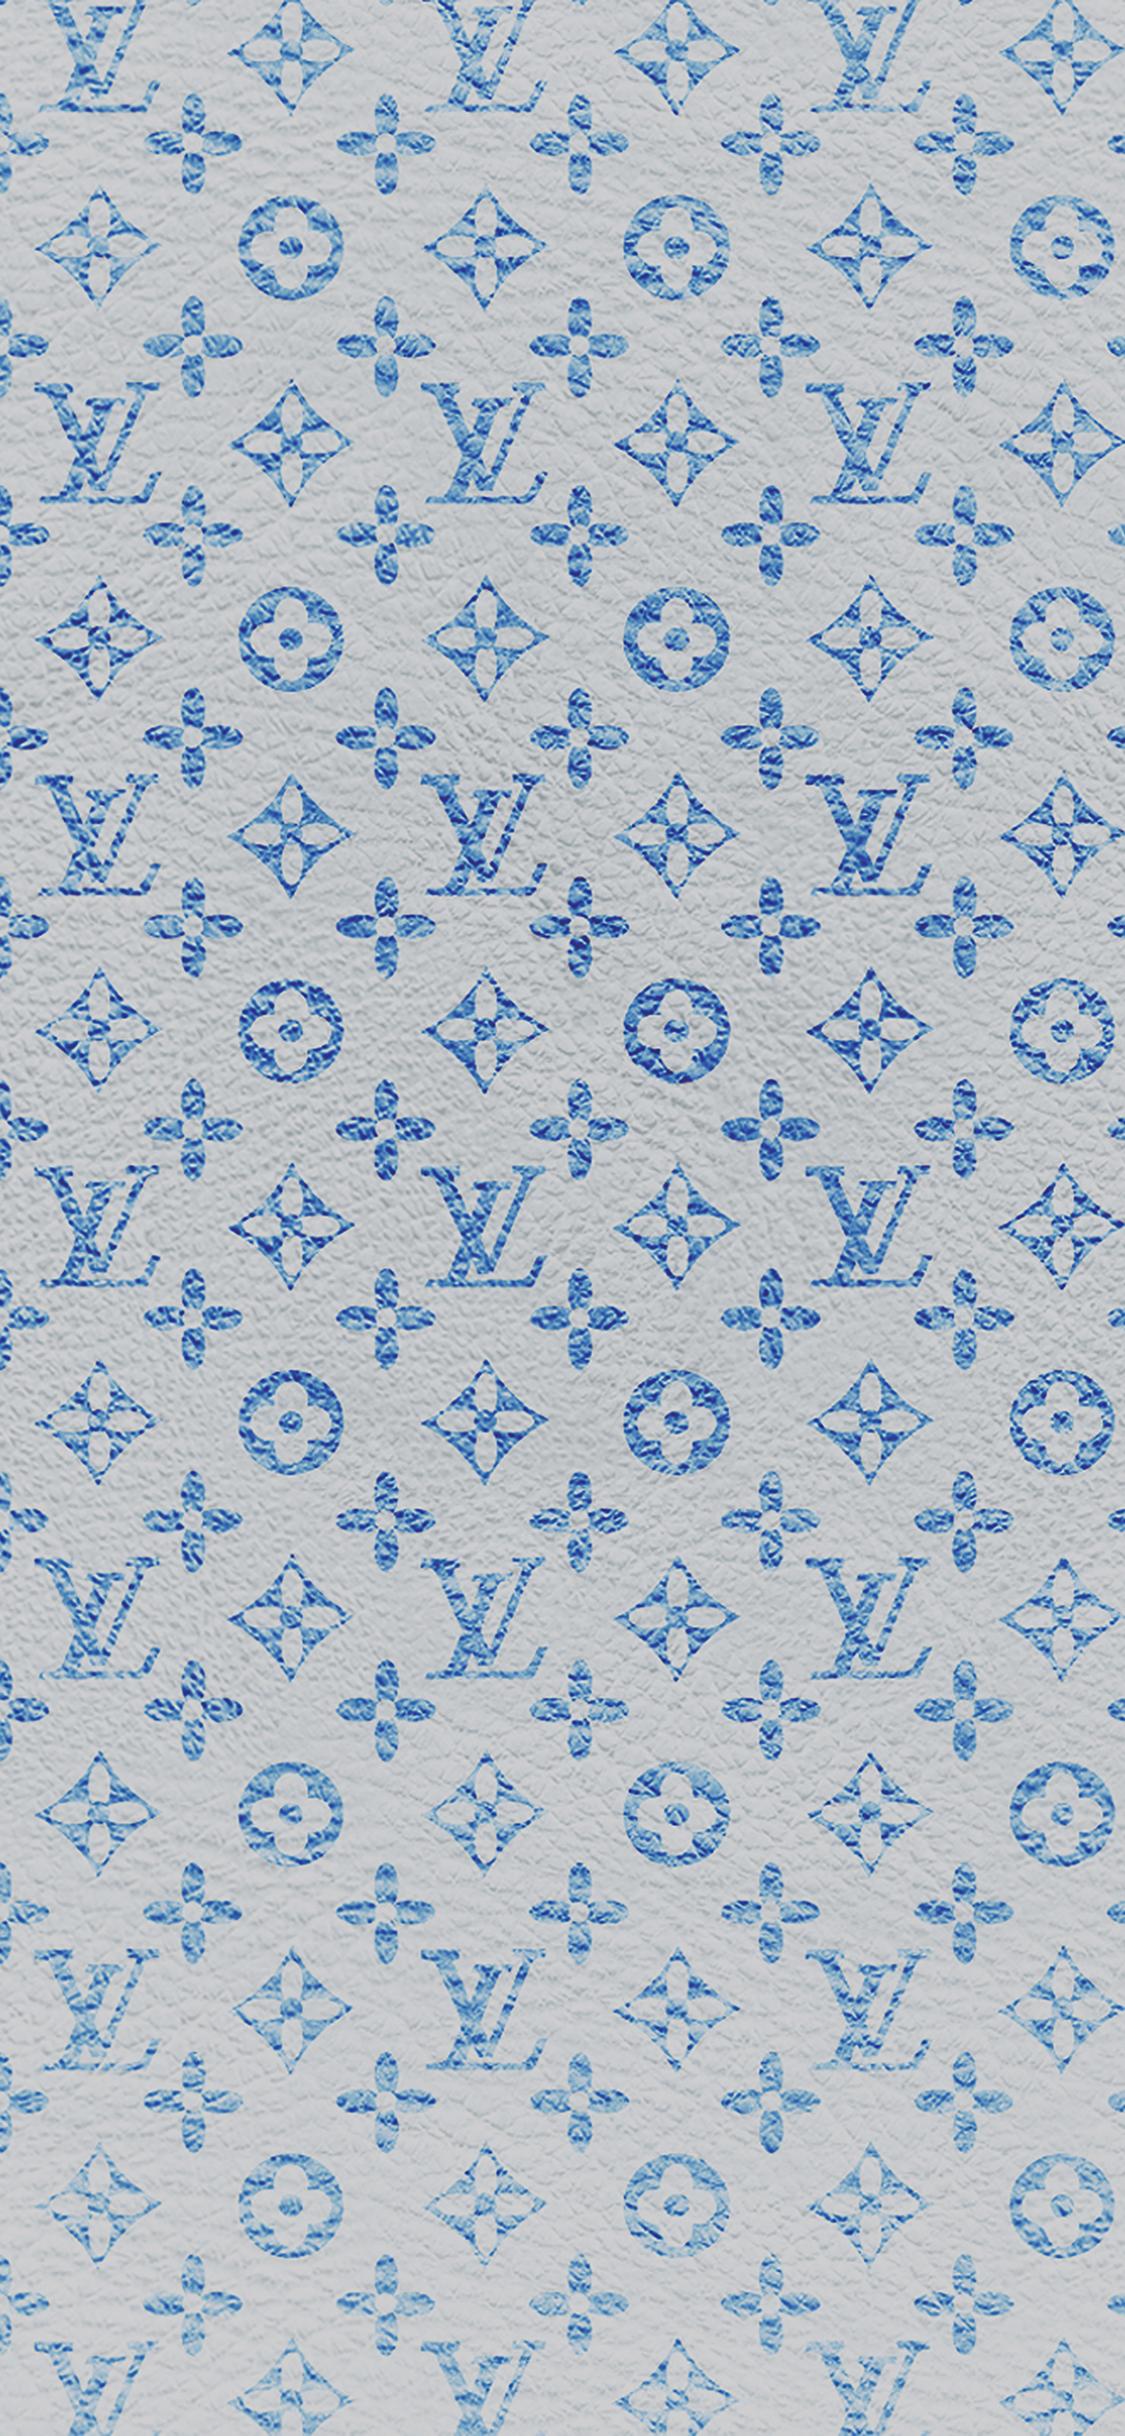 Snow Falling Wallpaper For Ipad Iphonexpapers Com Apple Iphone Wallpaper Vf21 Louis